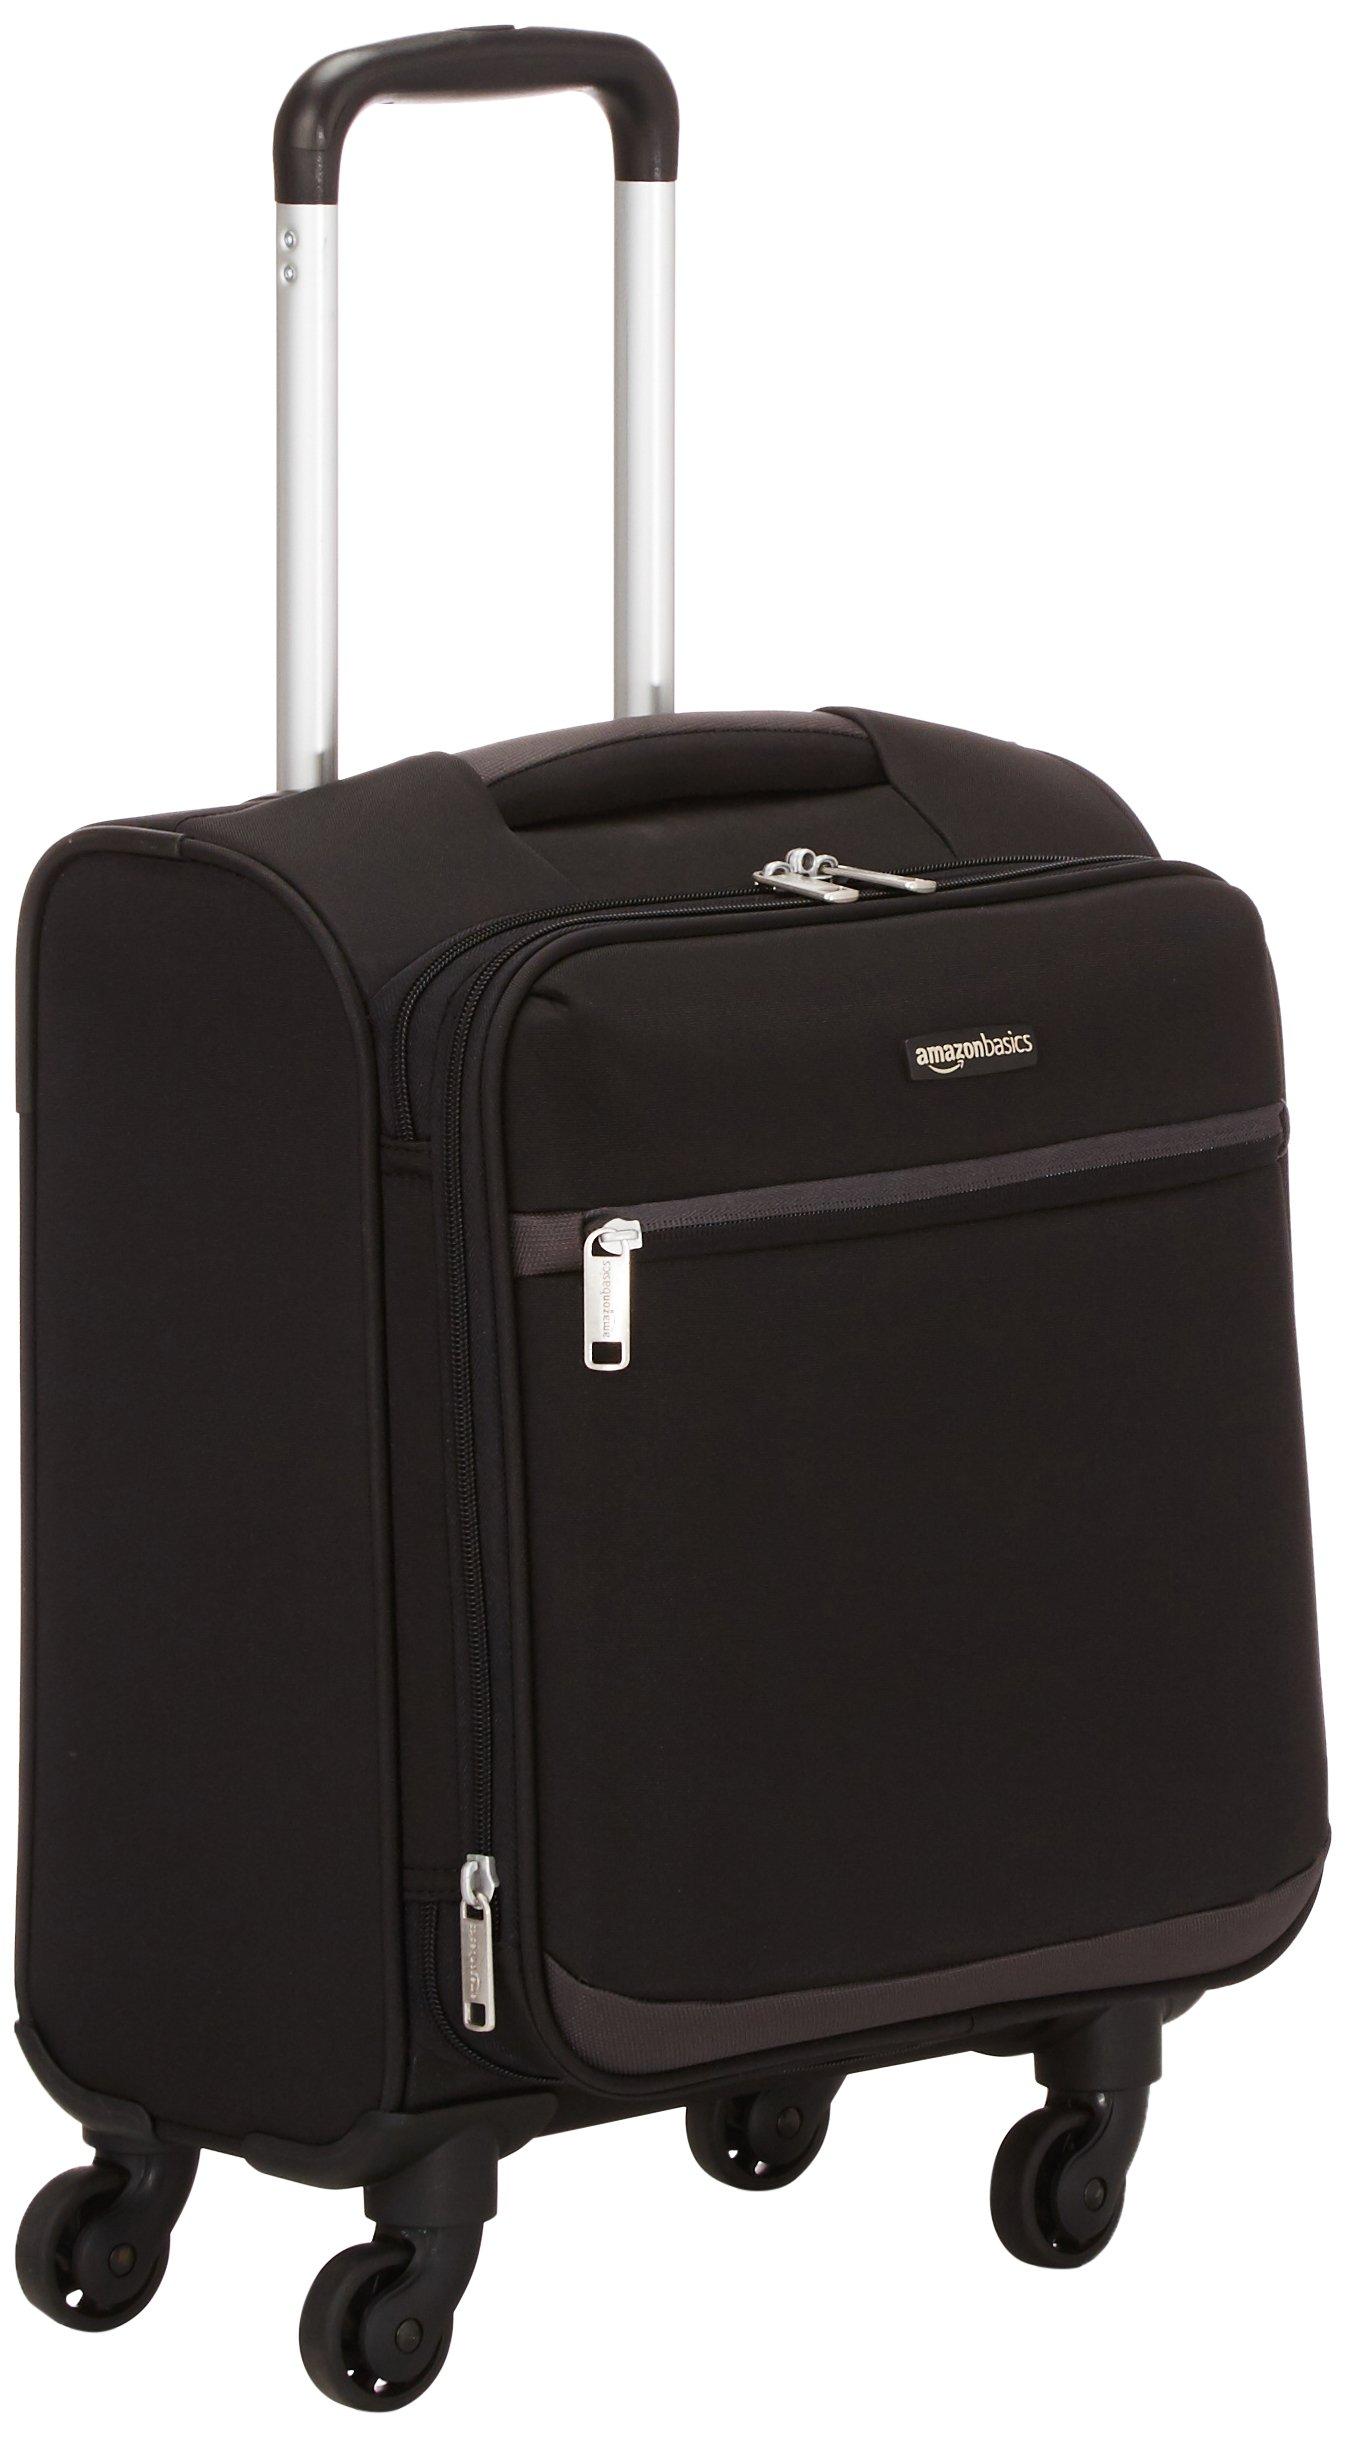 AmazonBasics Softside Spinner Luggage, 18-inch Carry-on/Cabin Size, Black